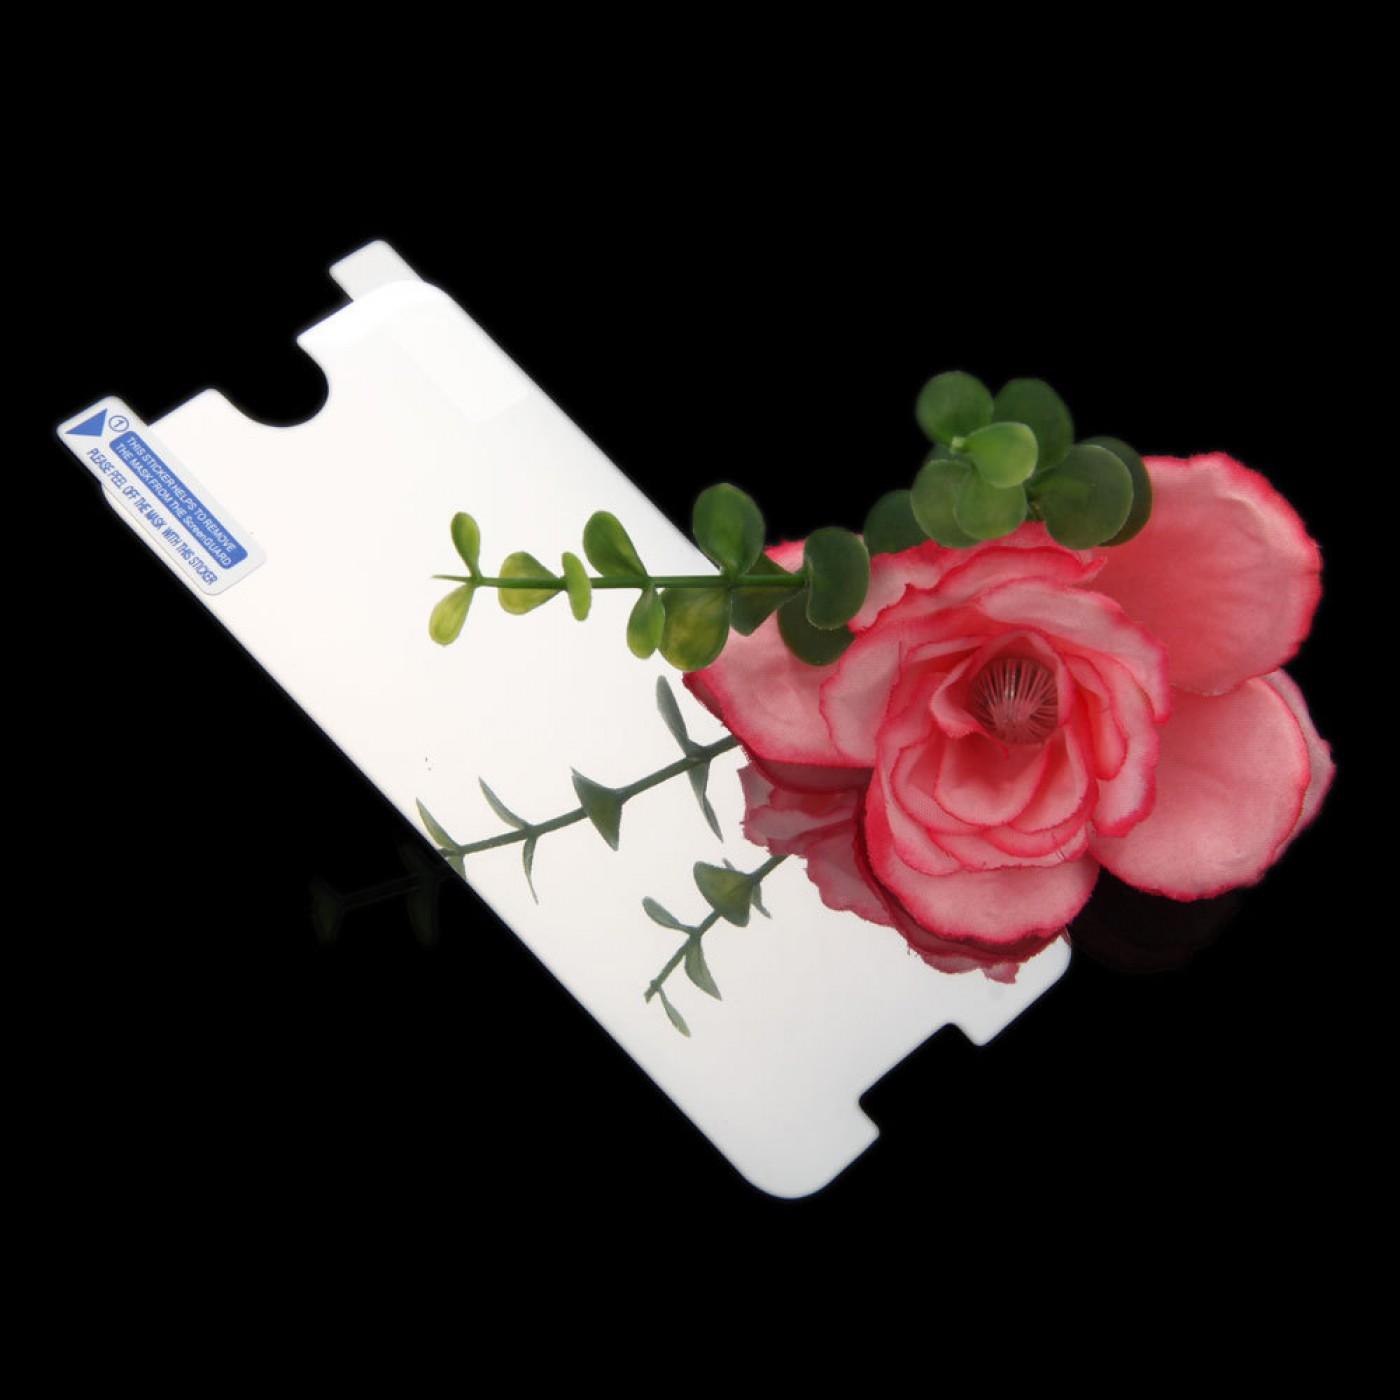 Film protecteur d 39 cran miroir iphone 6 plus for Film protecteur effet miroir